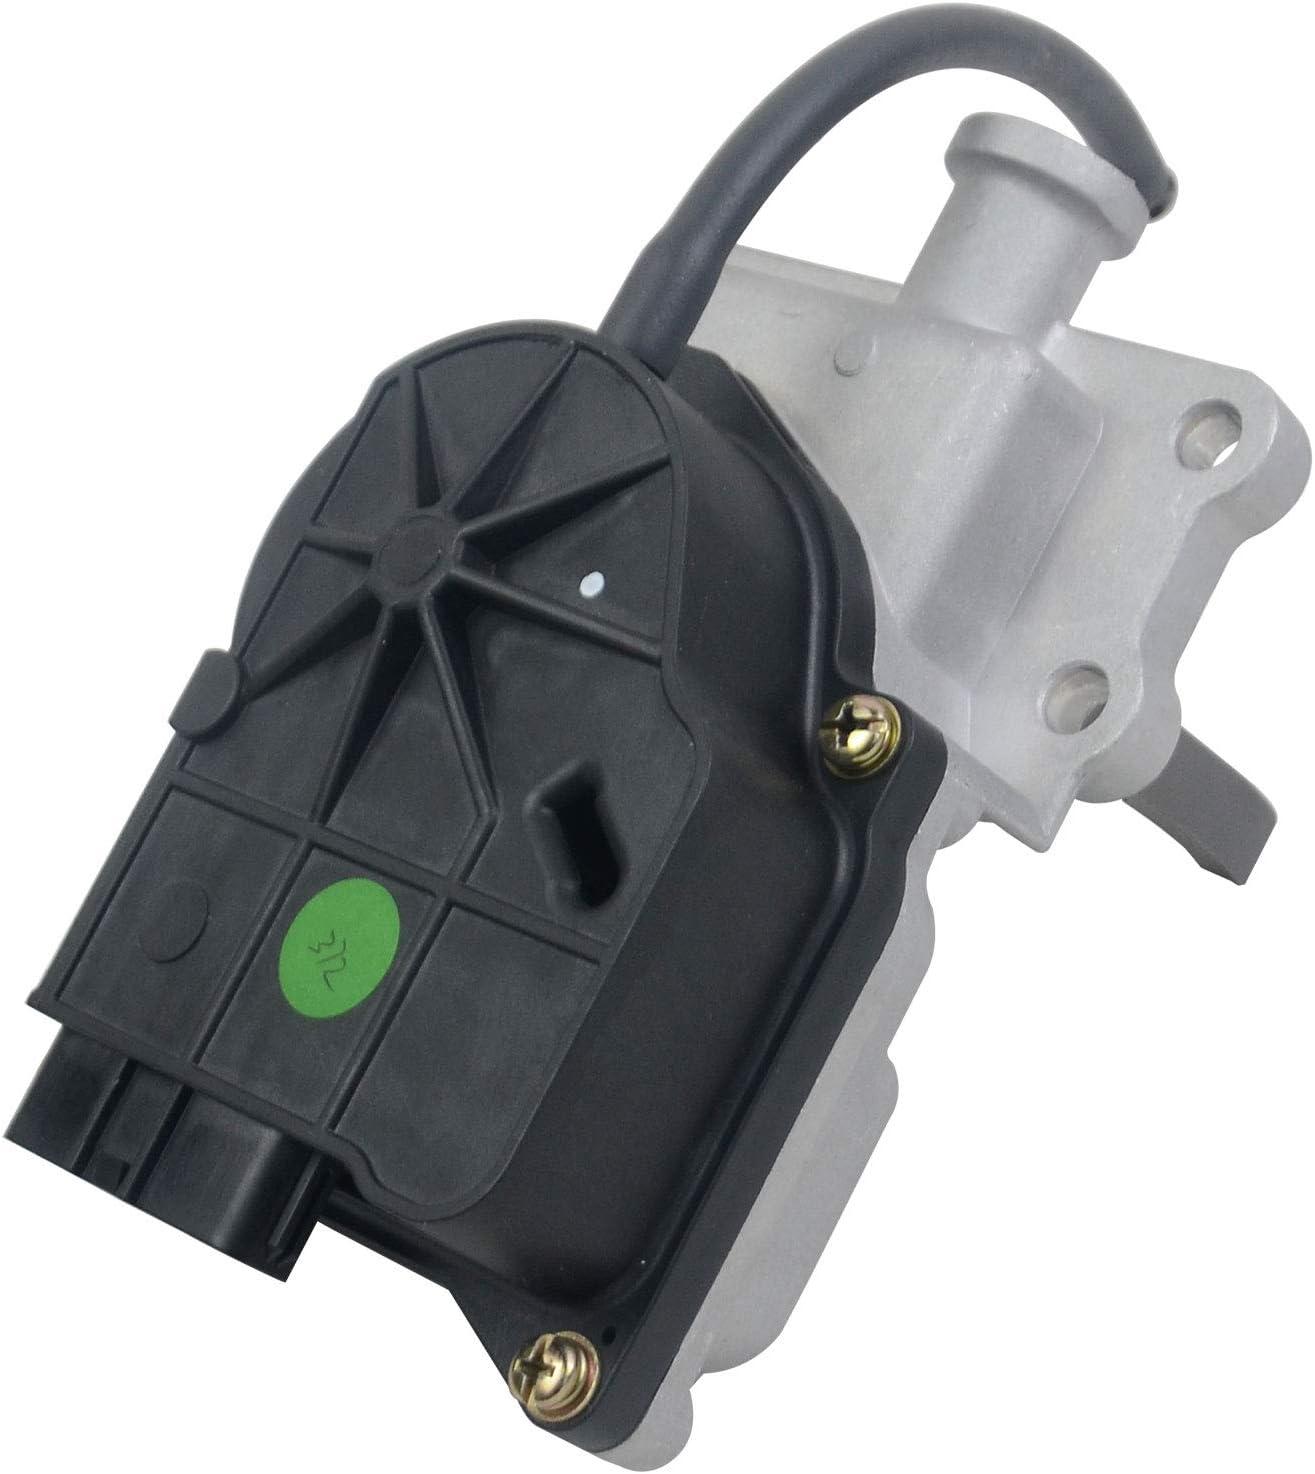 4WD Differential Vacuum Actuator Front for Tacoma 4Runner FJ Cruiser 2.7L 4.0L Part# 41400-35033 41400-35031 SSFL